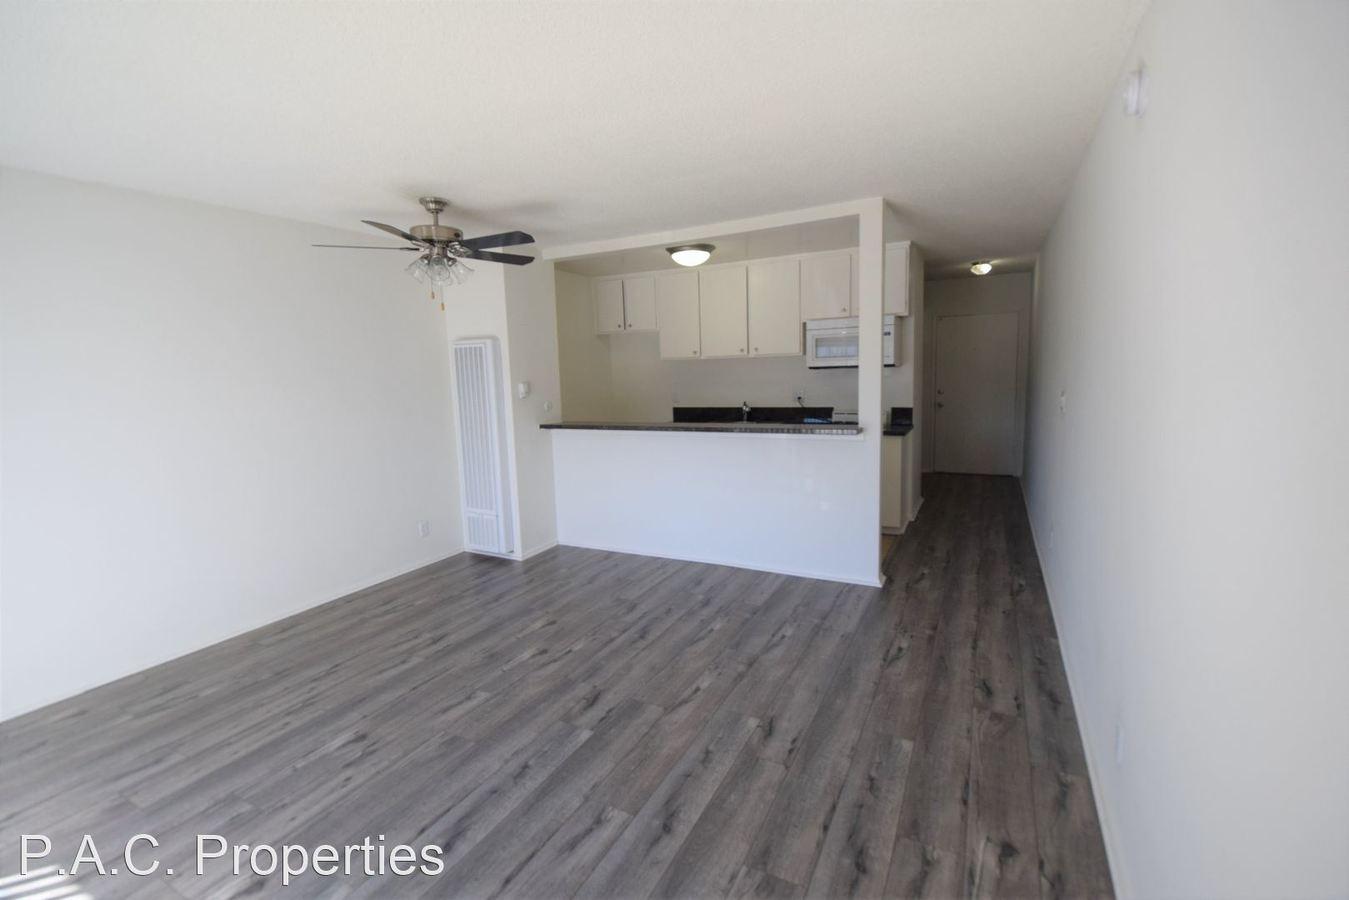 Studio 1 Bathroom Apartment for rent at 12255 Burbank Blvd in Valley Village, CA